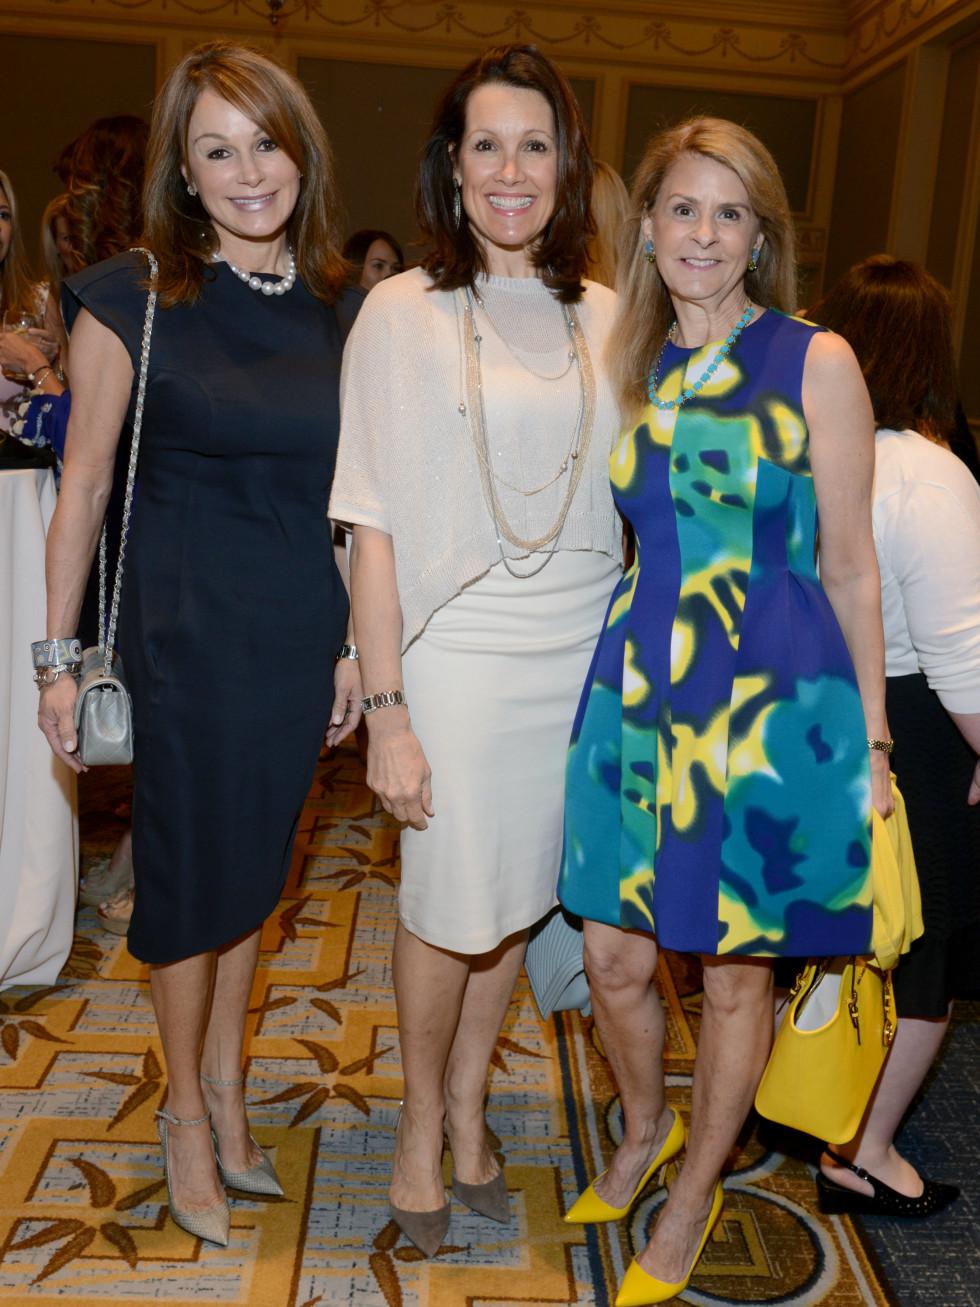 Claire Emanuelson, Pam Perella, Caren Kline